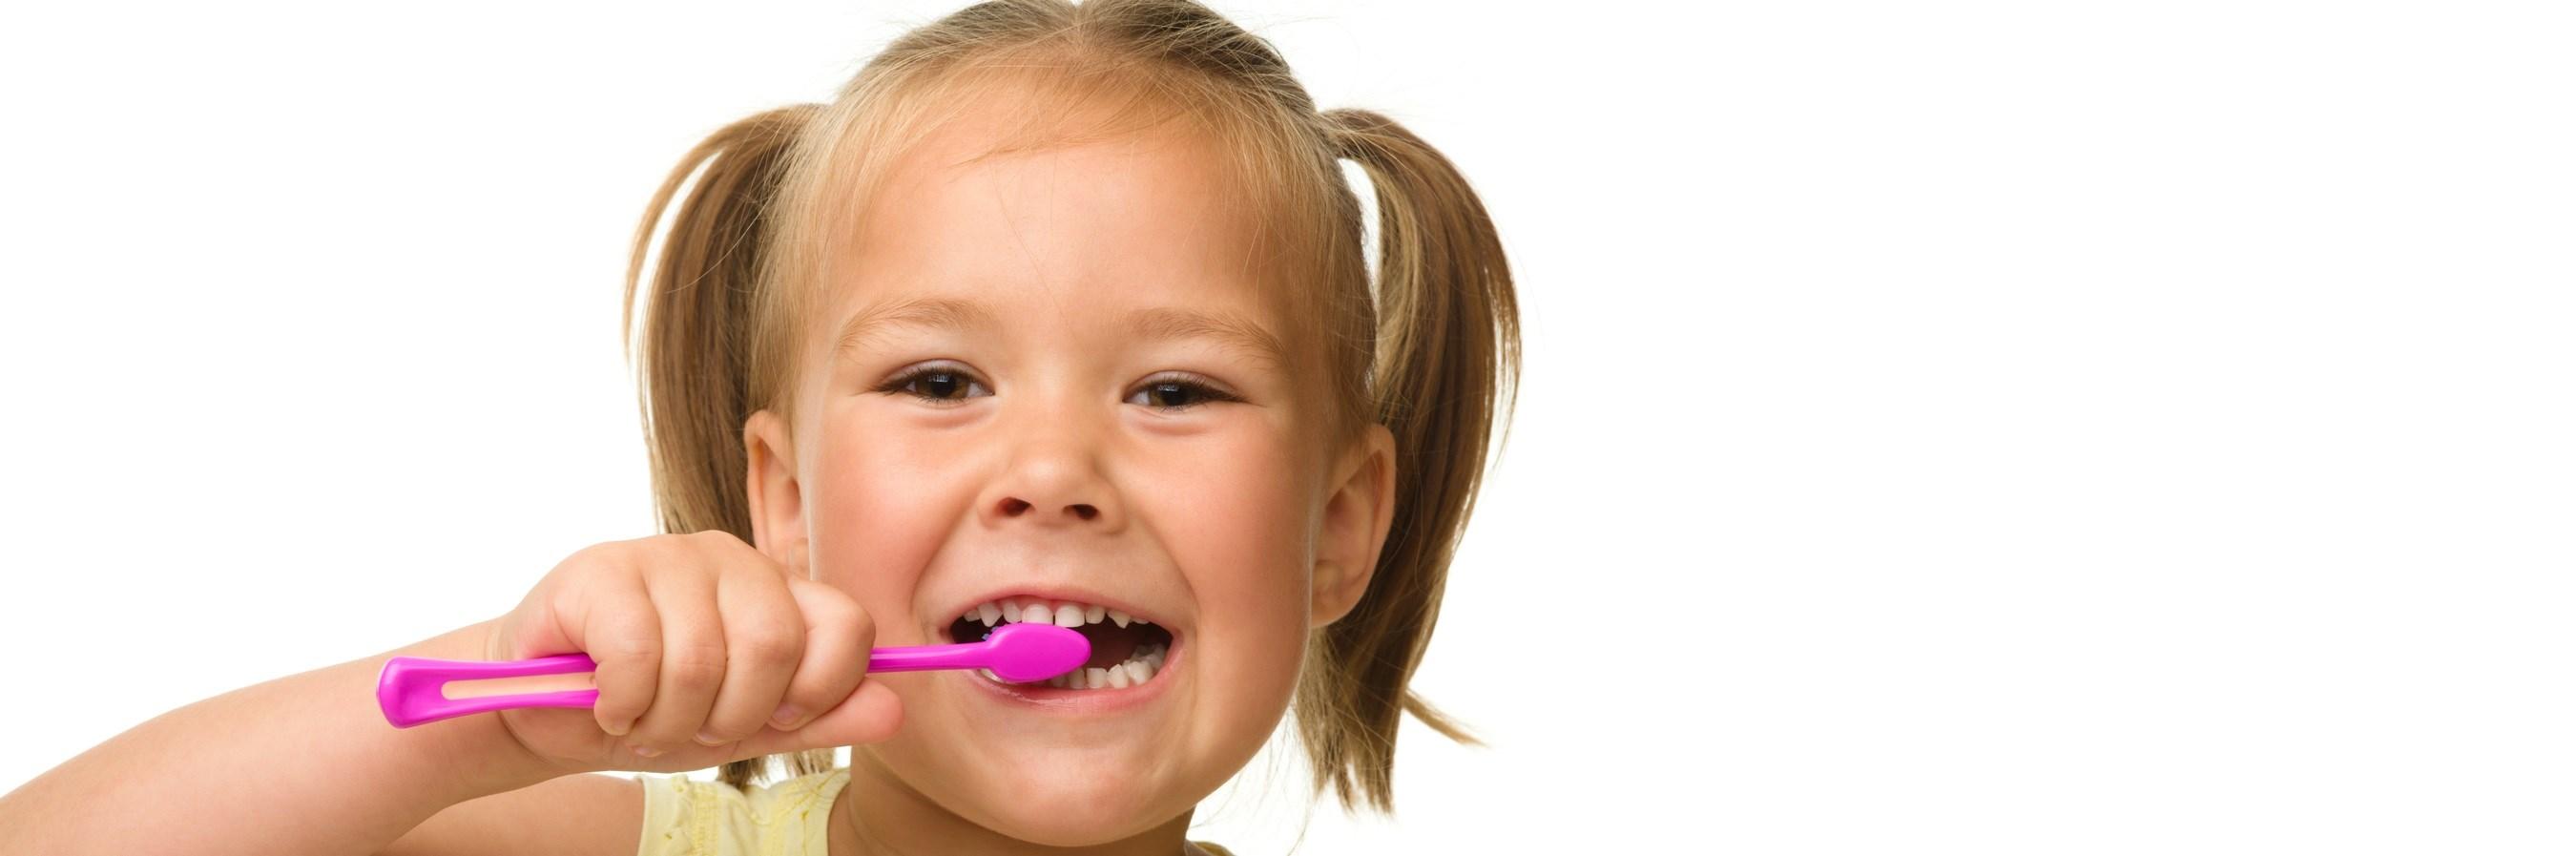 photodune-681586-little-girl-is-cleaning-teeth-using-toothbrush-m1